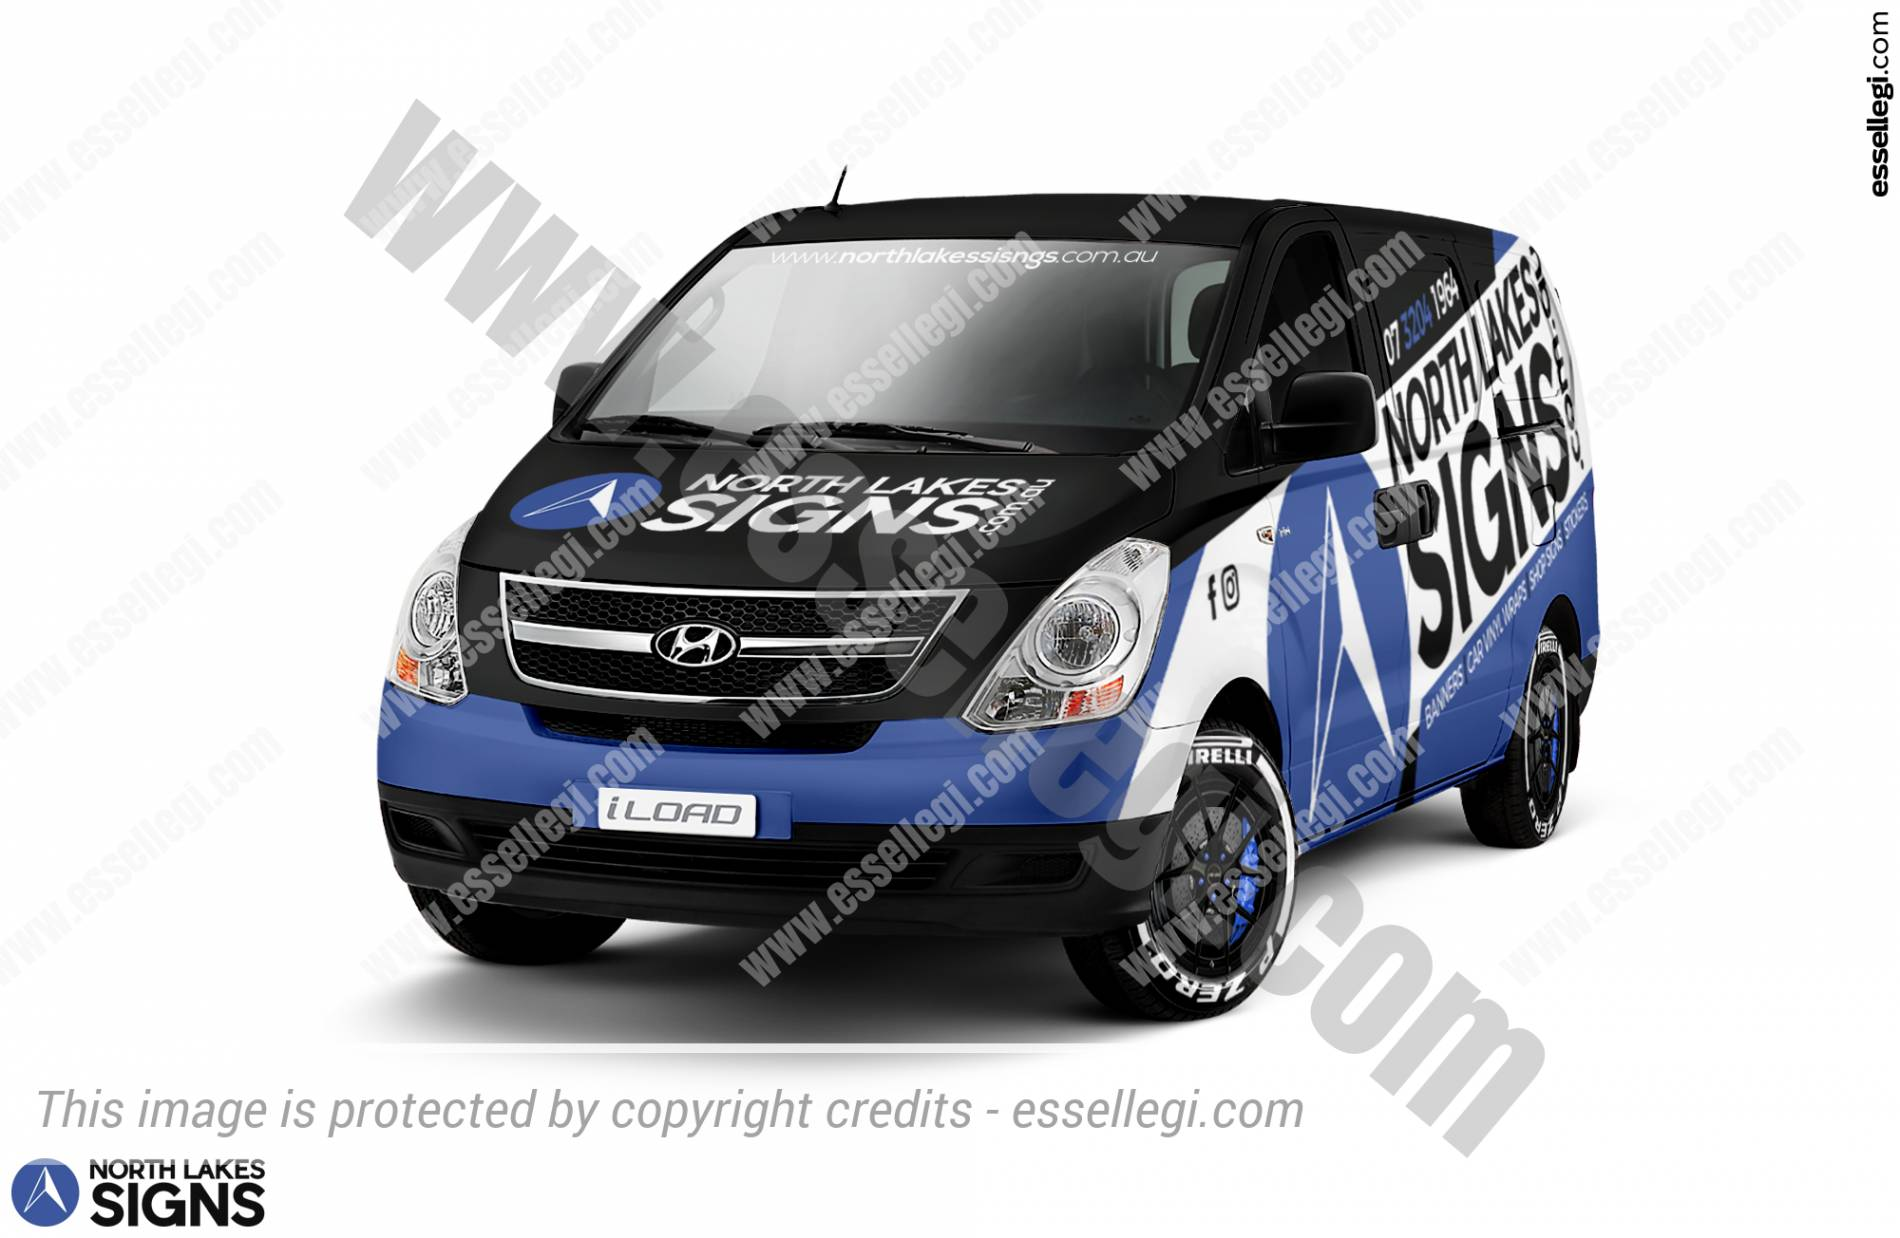 Hyundai iLoad Wrap Design. Hyundai iLoad   Van Wrap Design by Essellegi. Van Signs, Van Signage, Van Wrapping, Van Signwriting, Van Wrap Designer, Signs for Van, Van Logo, Van Graphic by Essellegi.